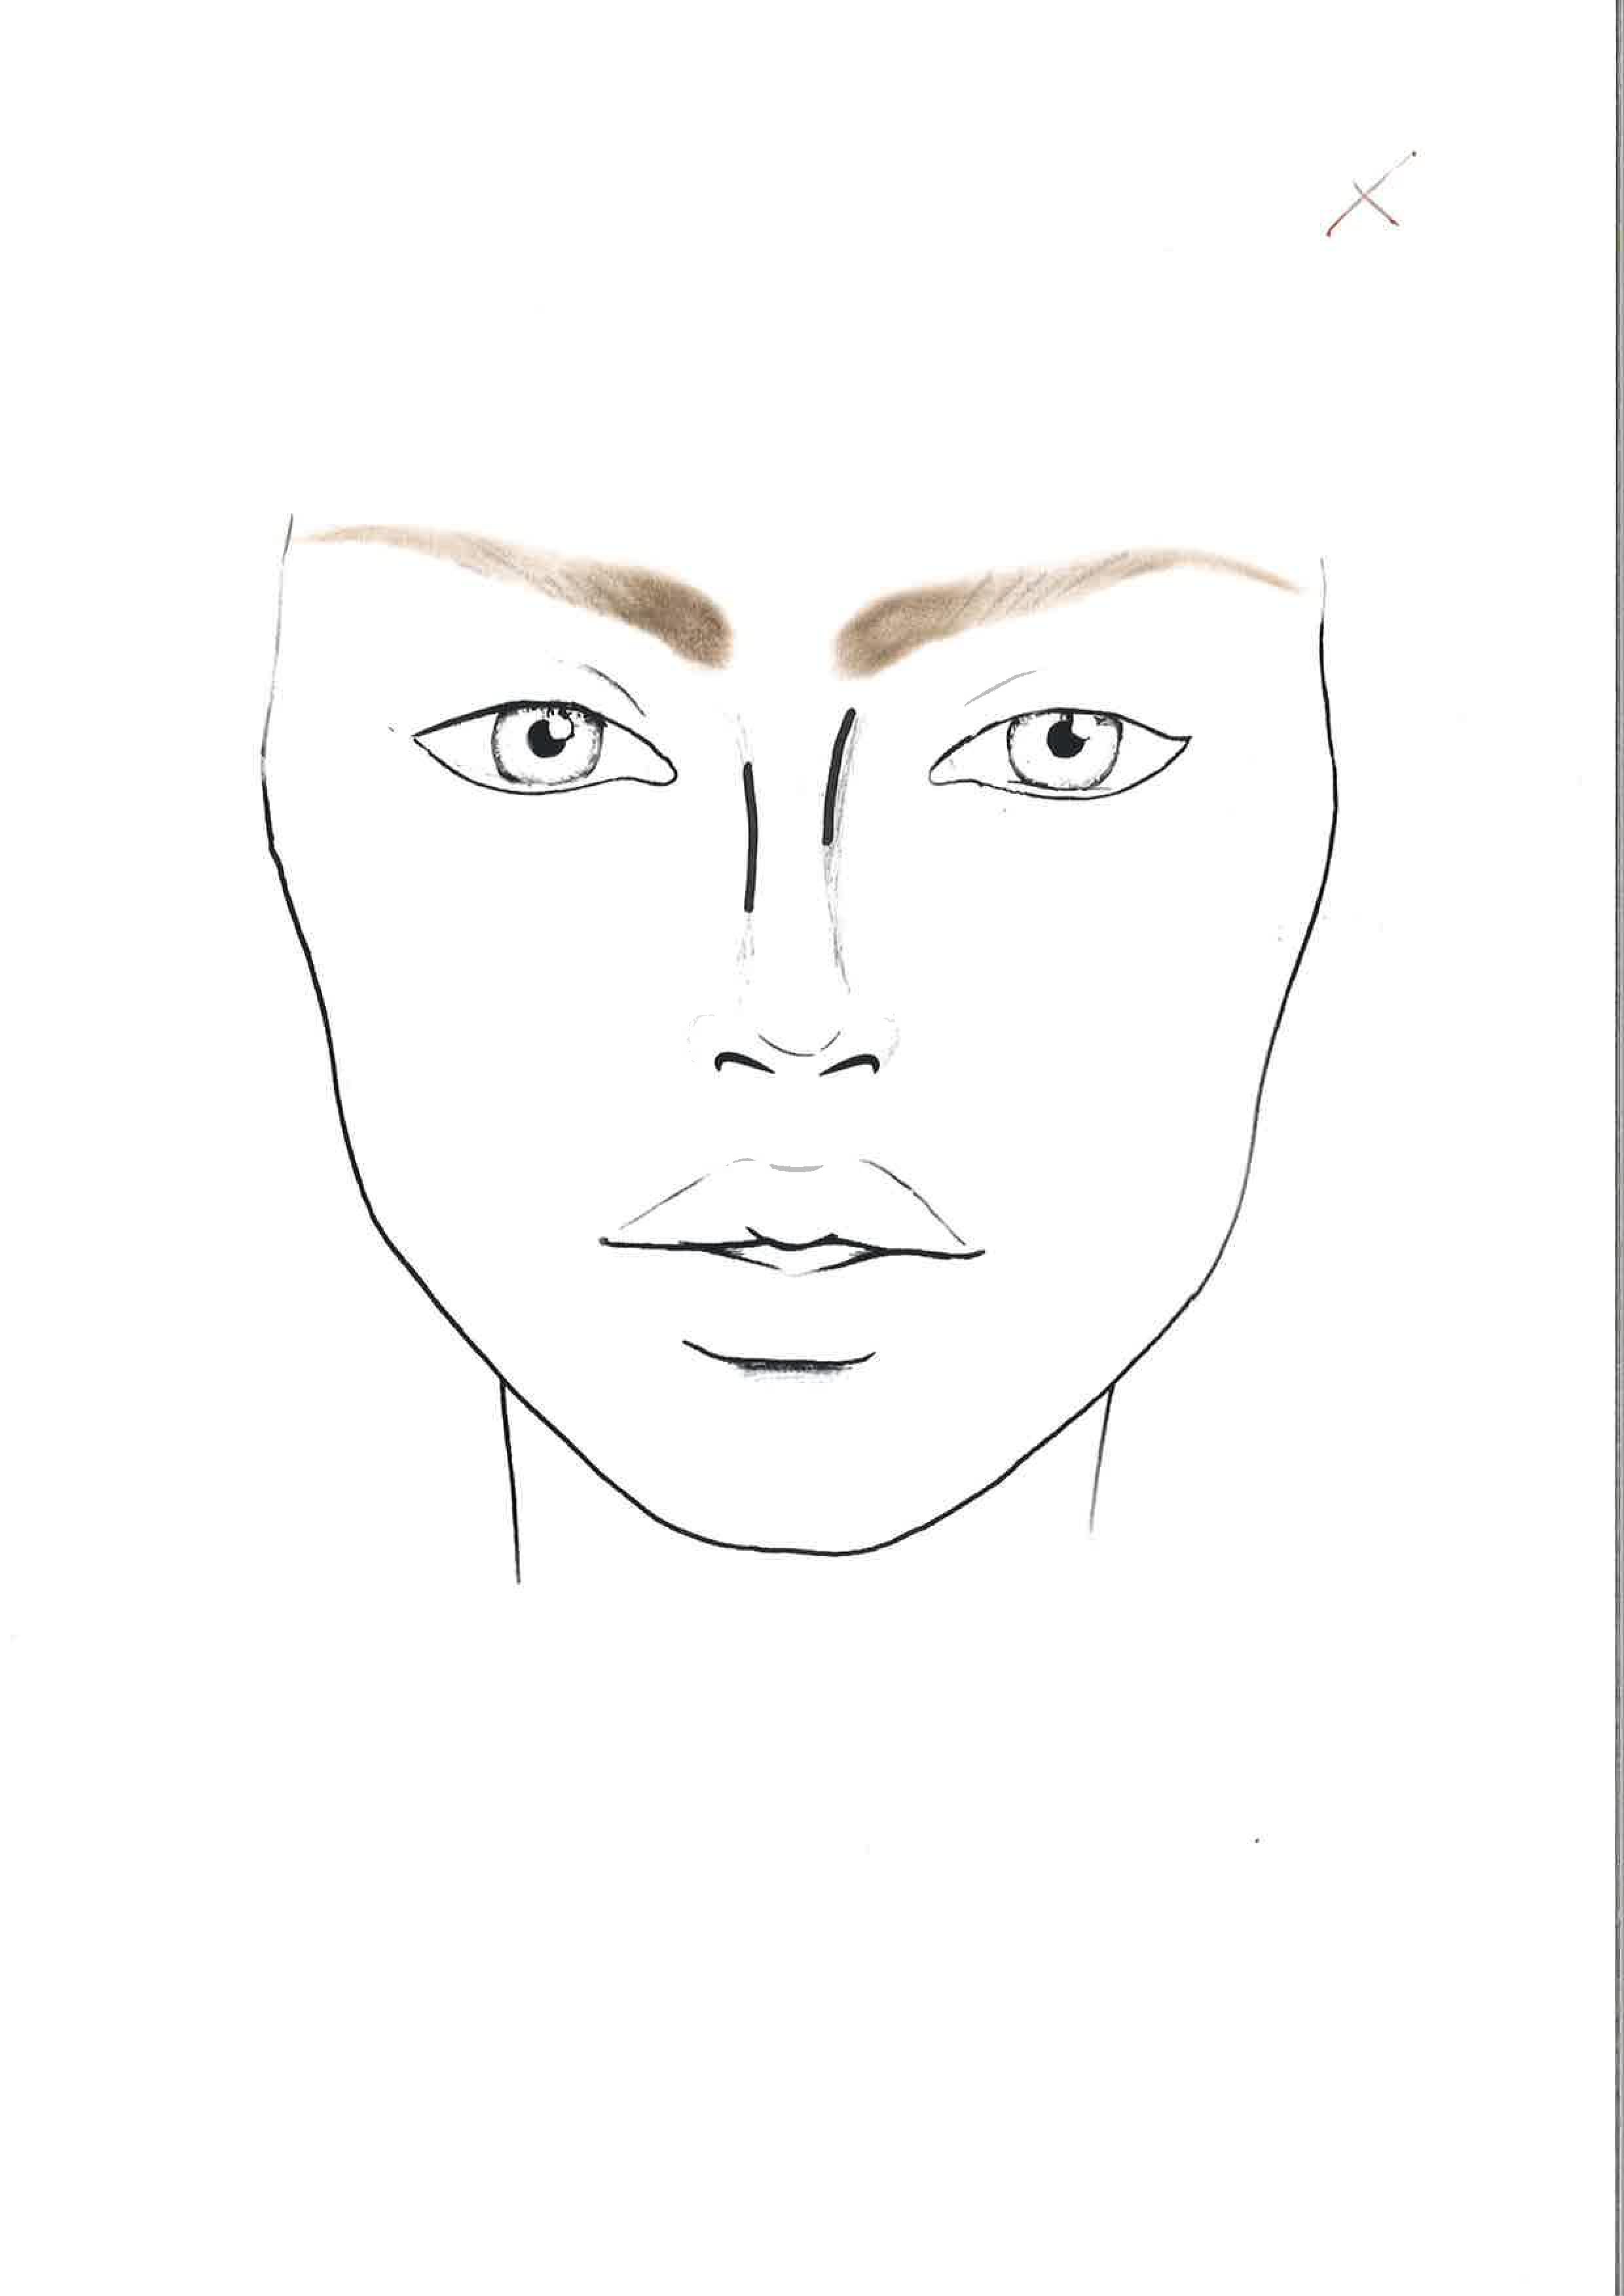 szemoldok-face-chart-rossz-pelda.jpg